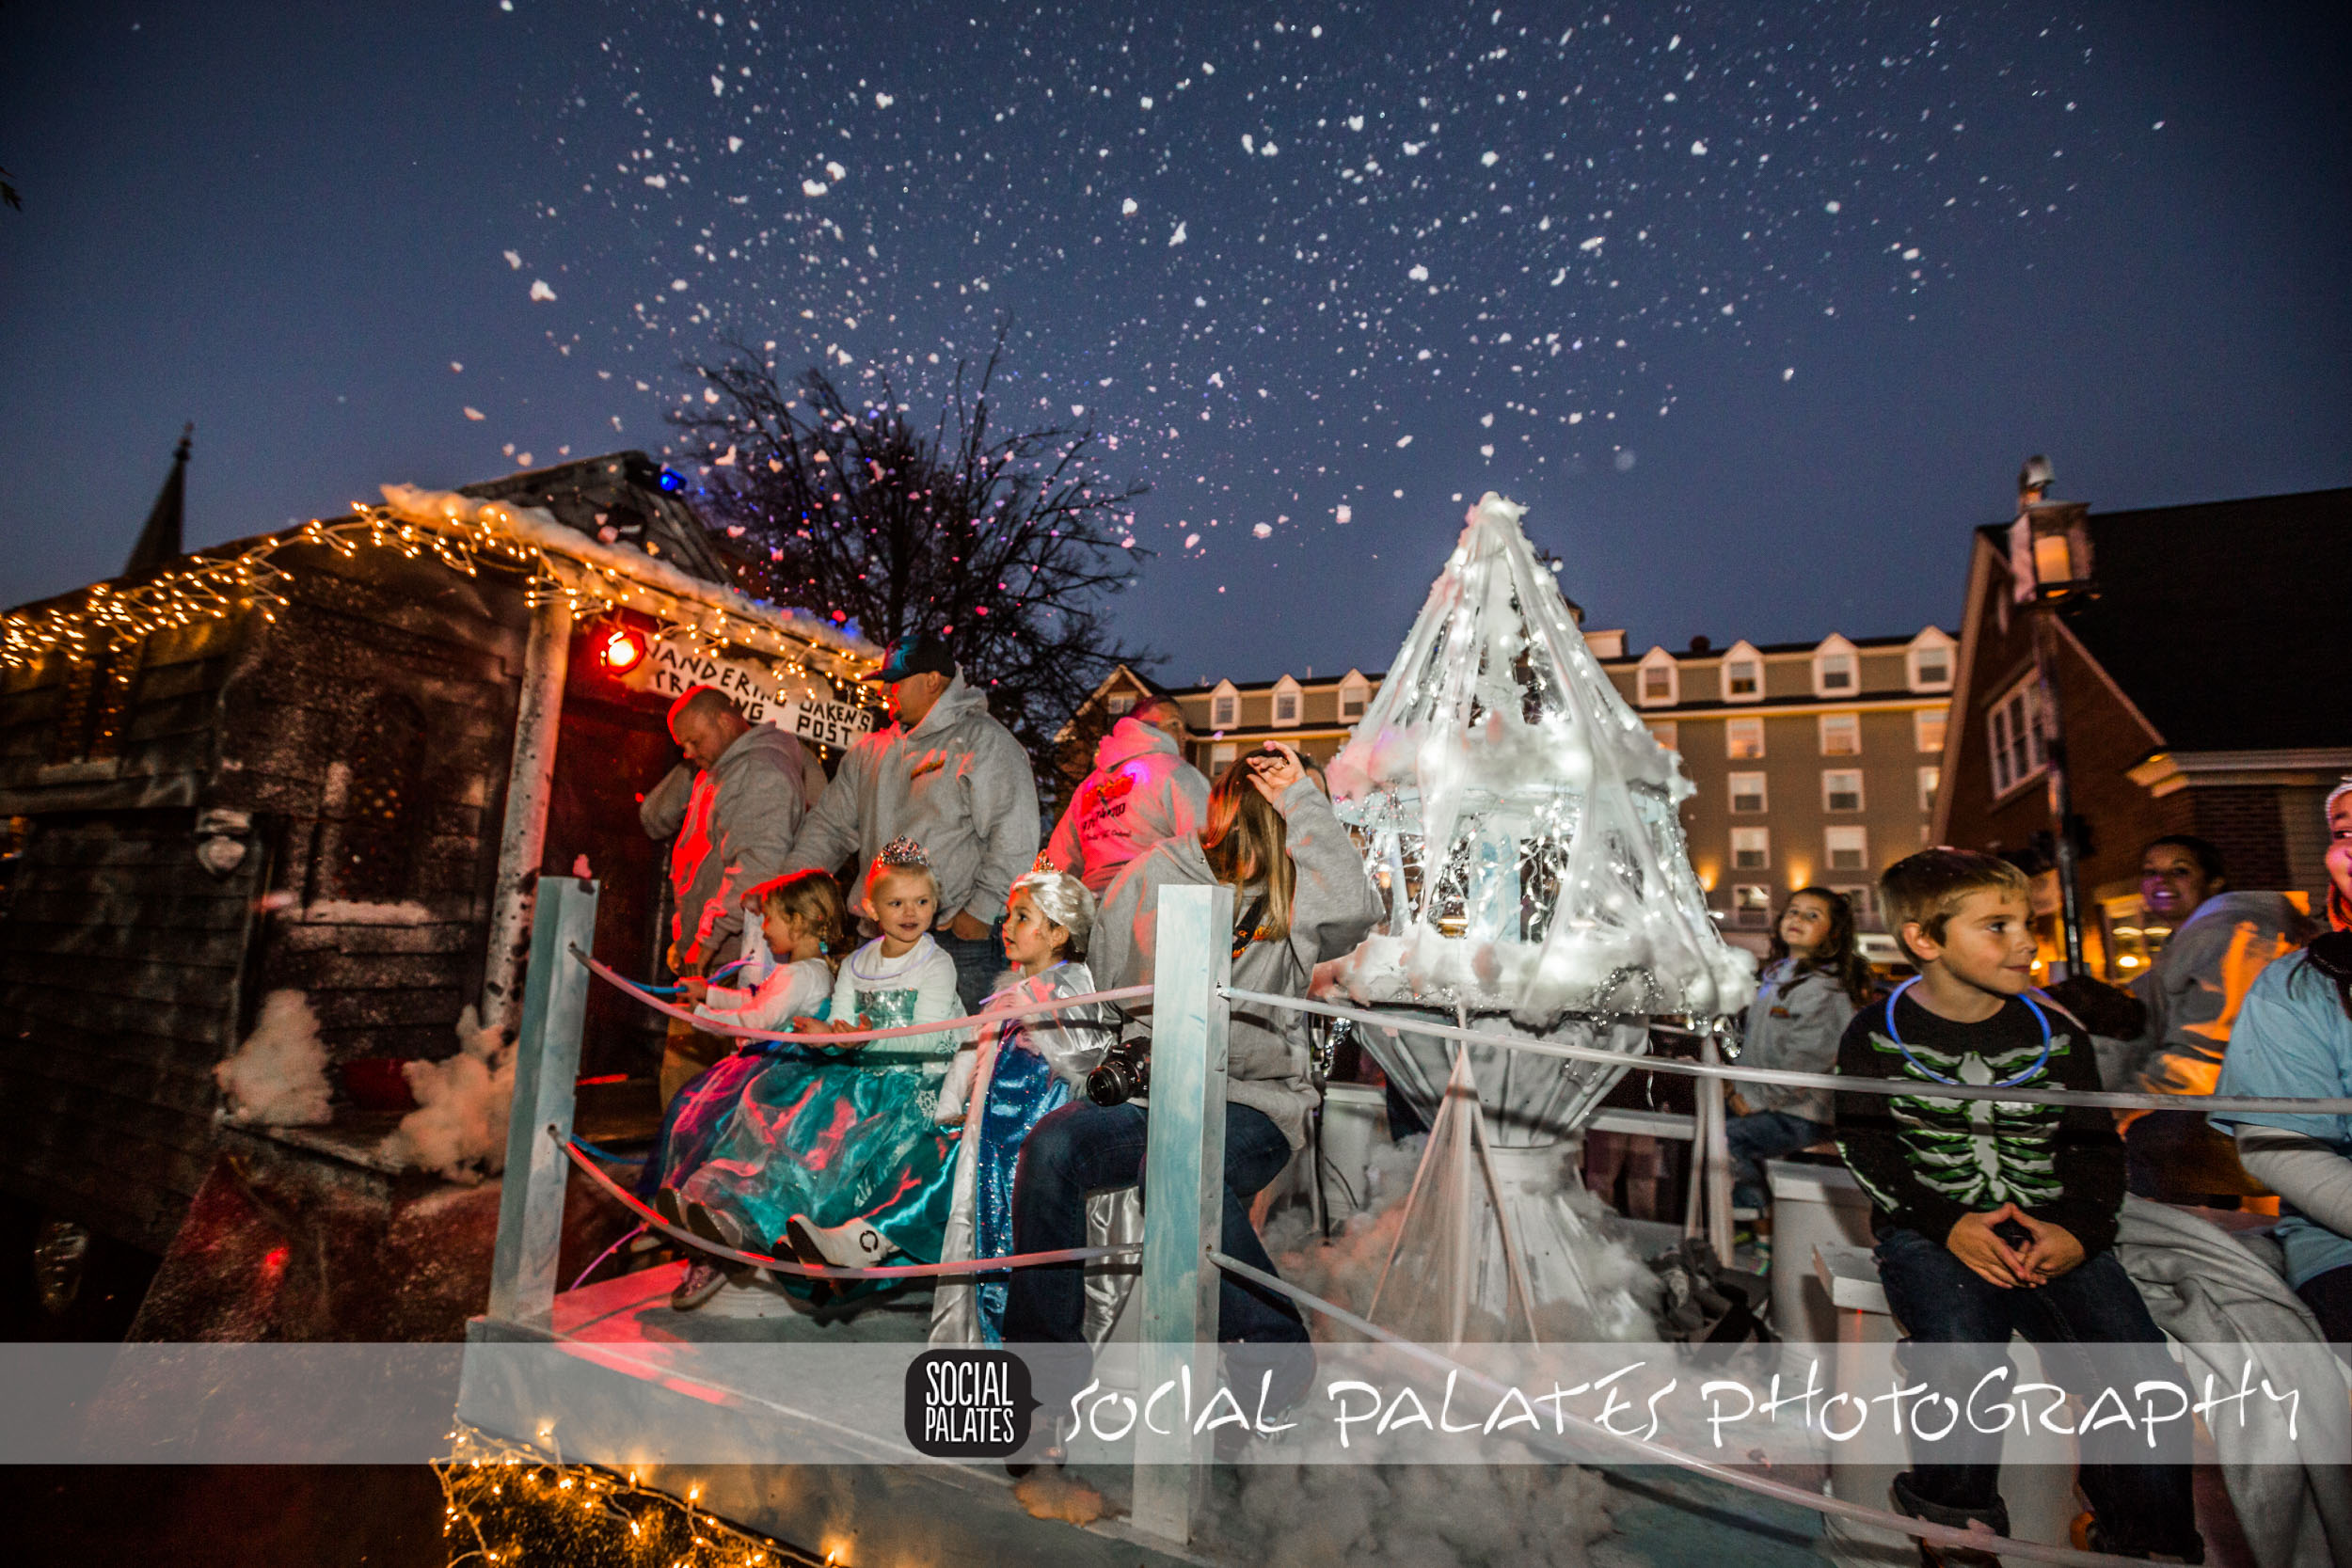 Haunted Happenings Parade 2014 Creative Salem by Social Palates-7431.jpg